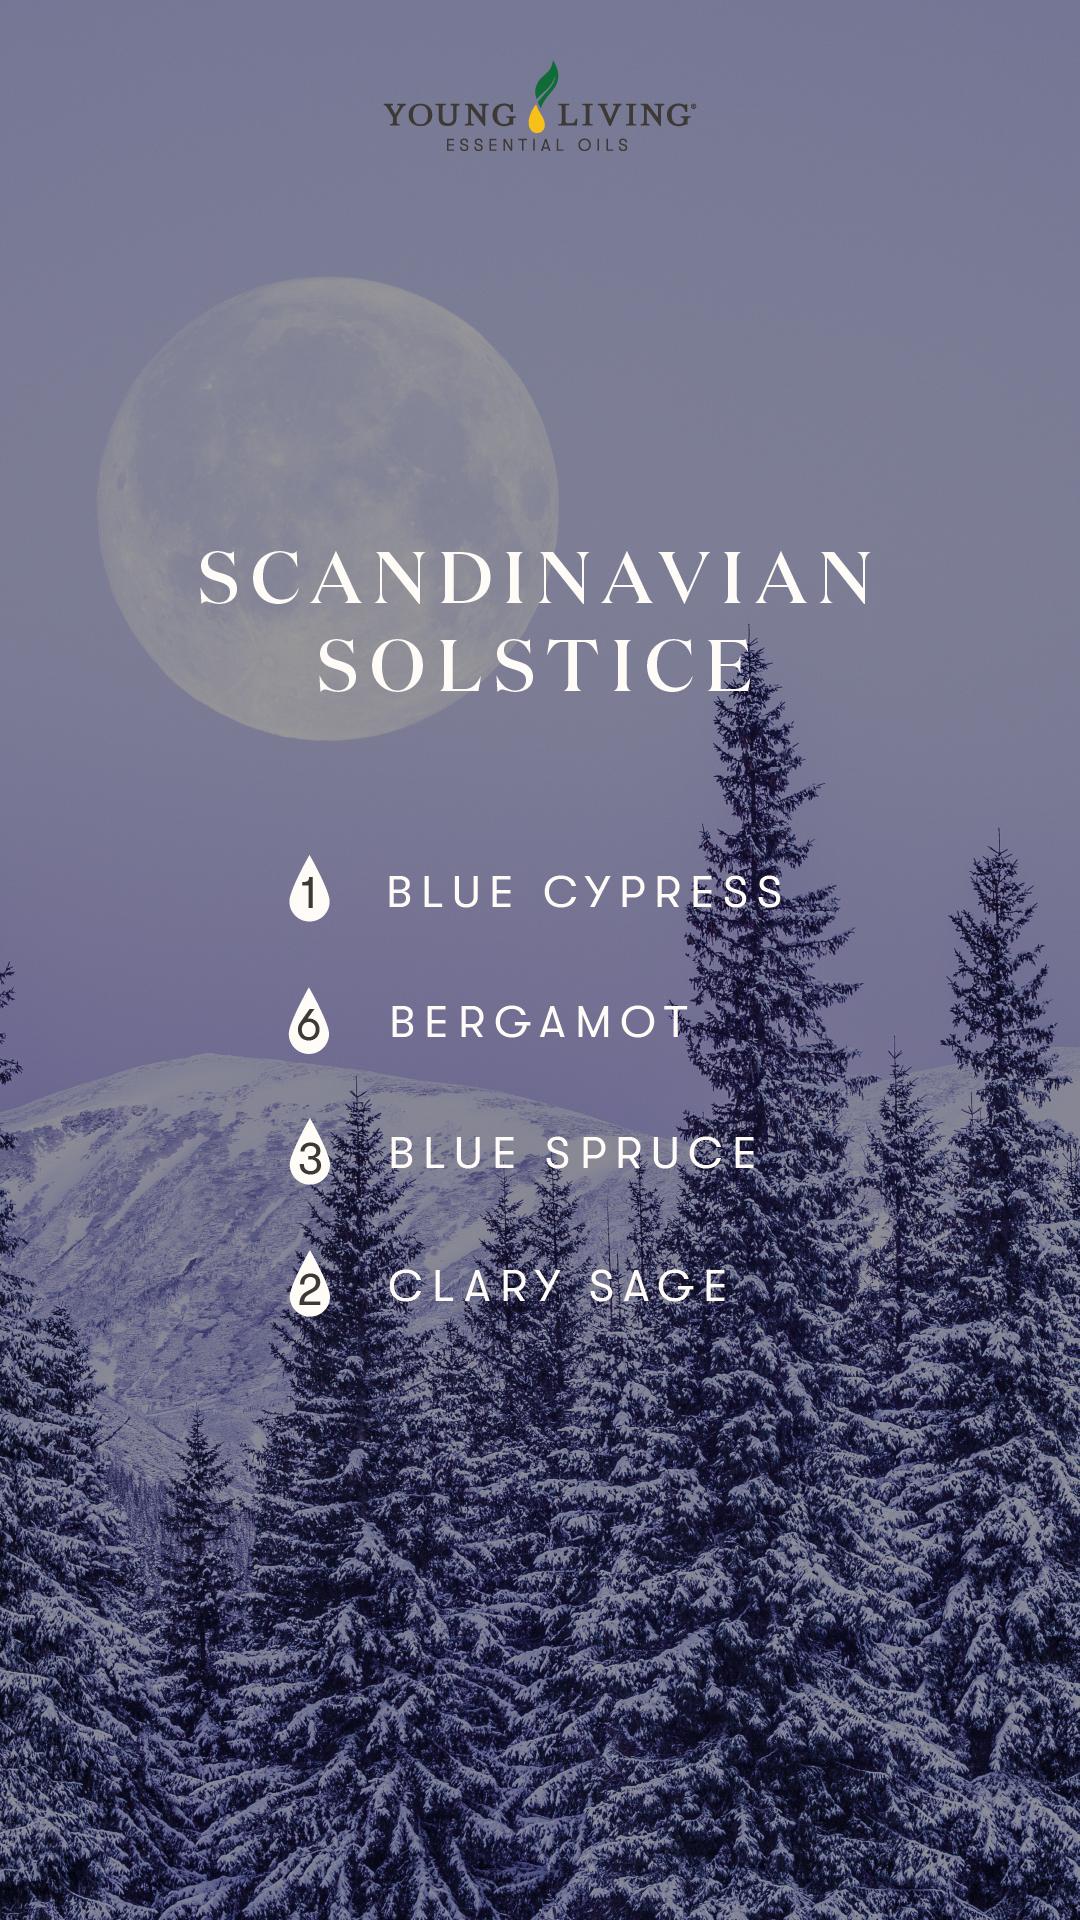 Scandinavian Solstice Diffuser blend